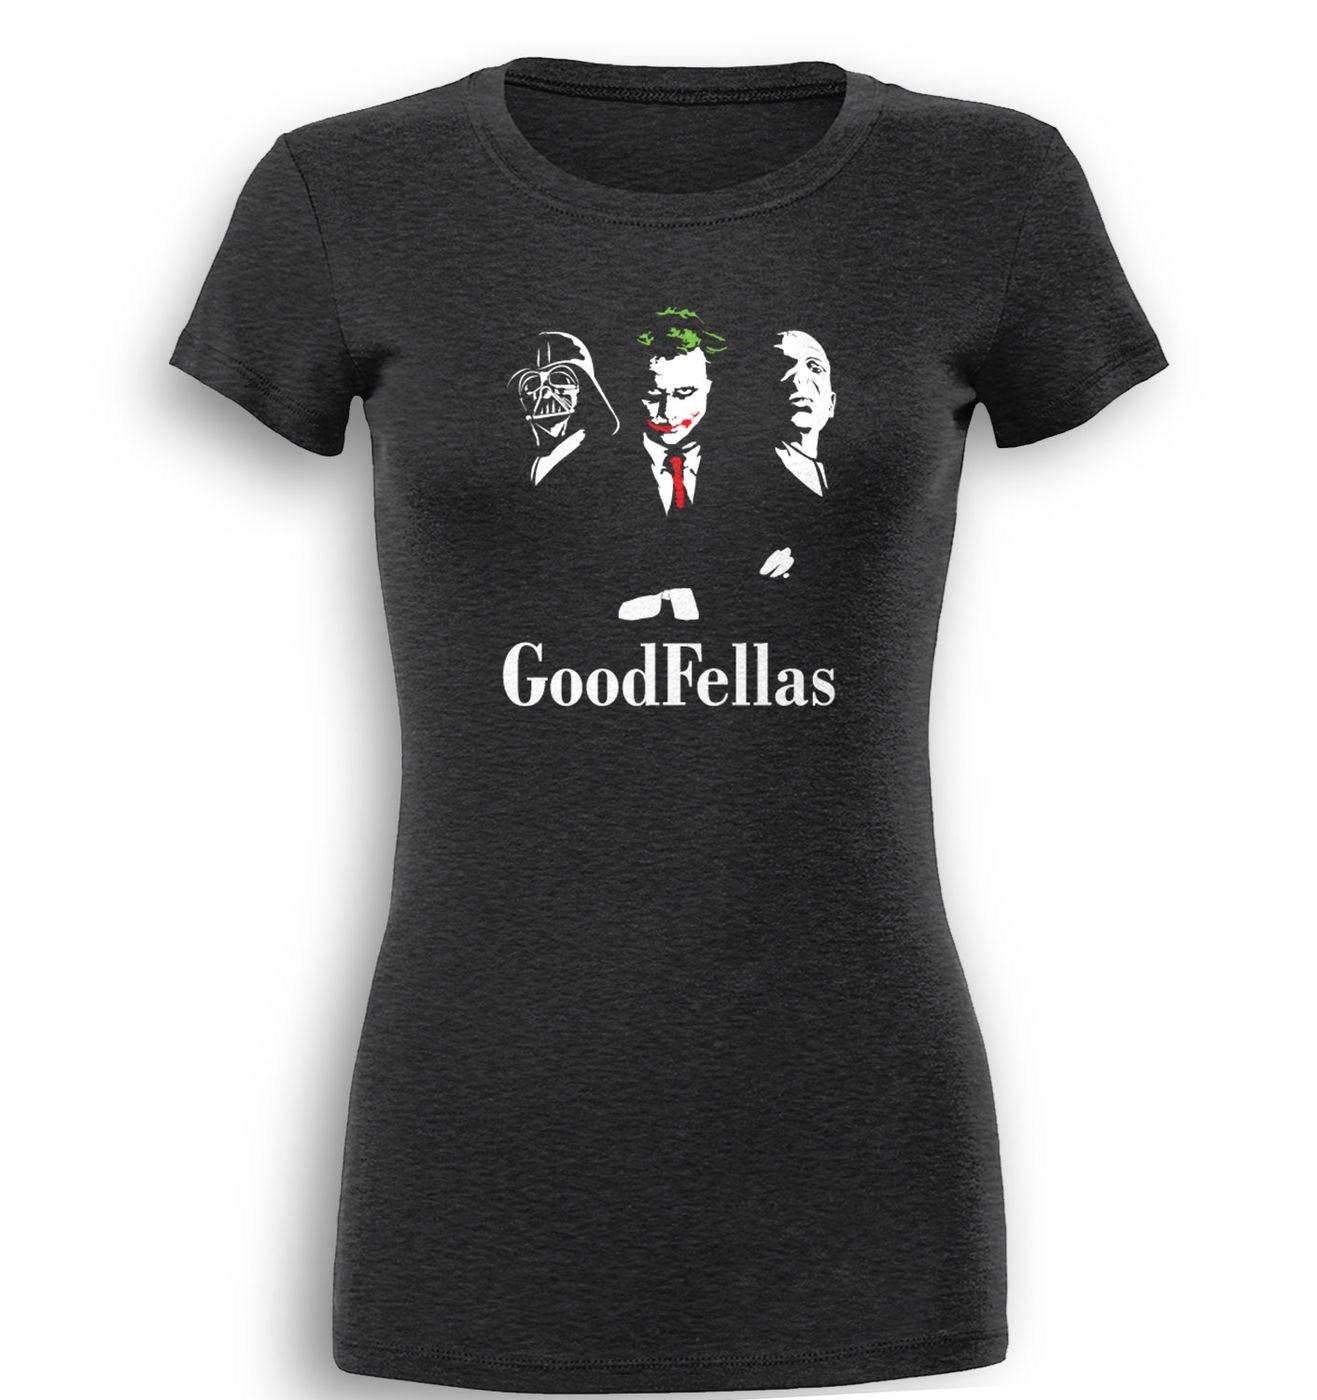 Goodfellas premium women's t-shirt by Something Geeky